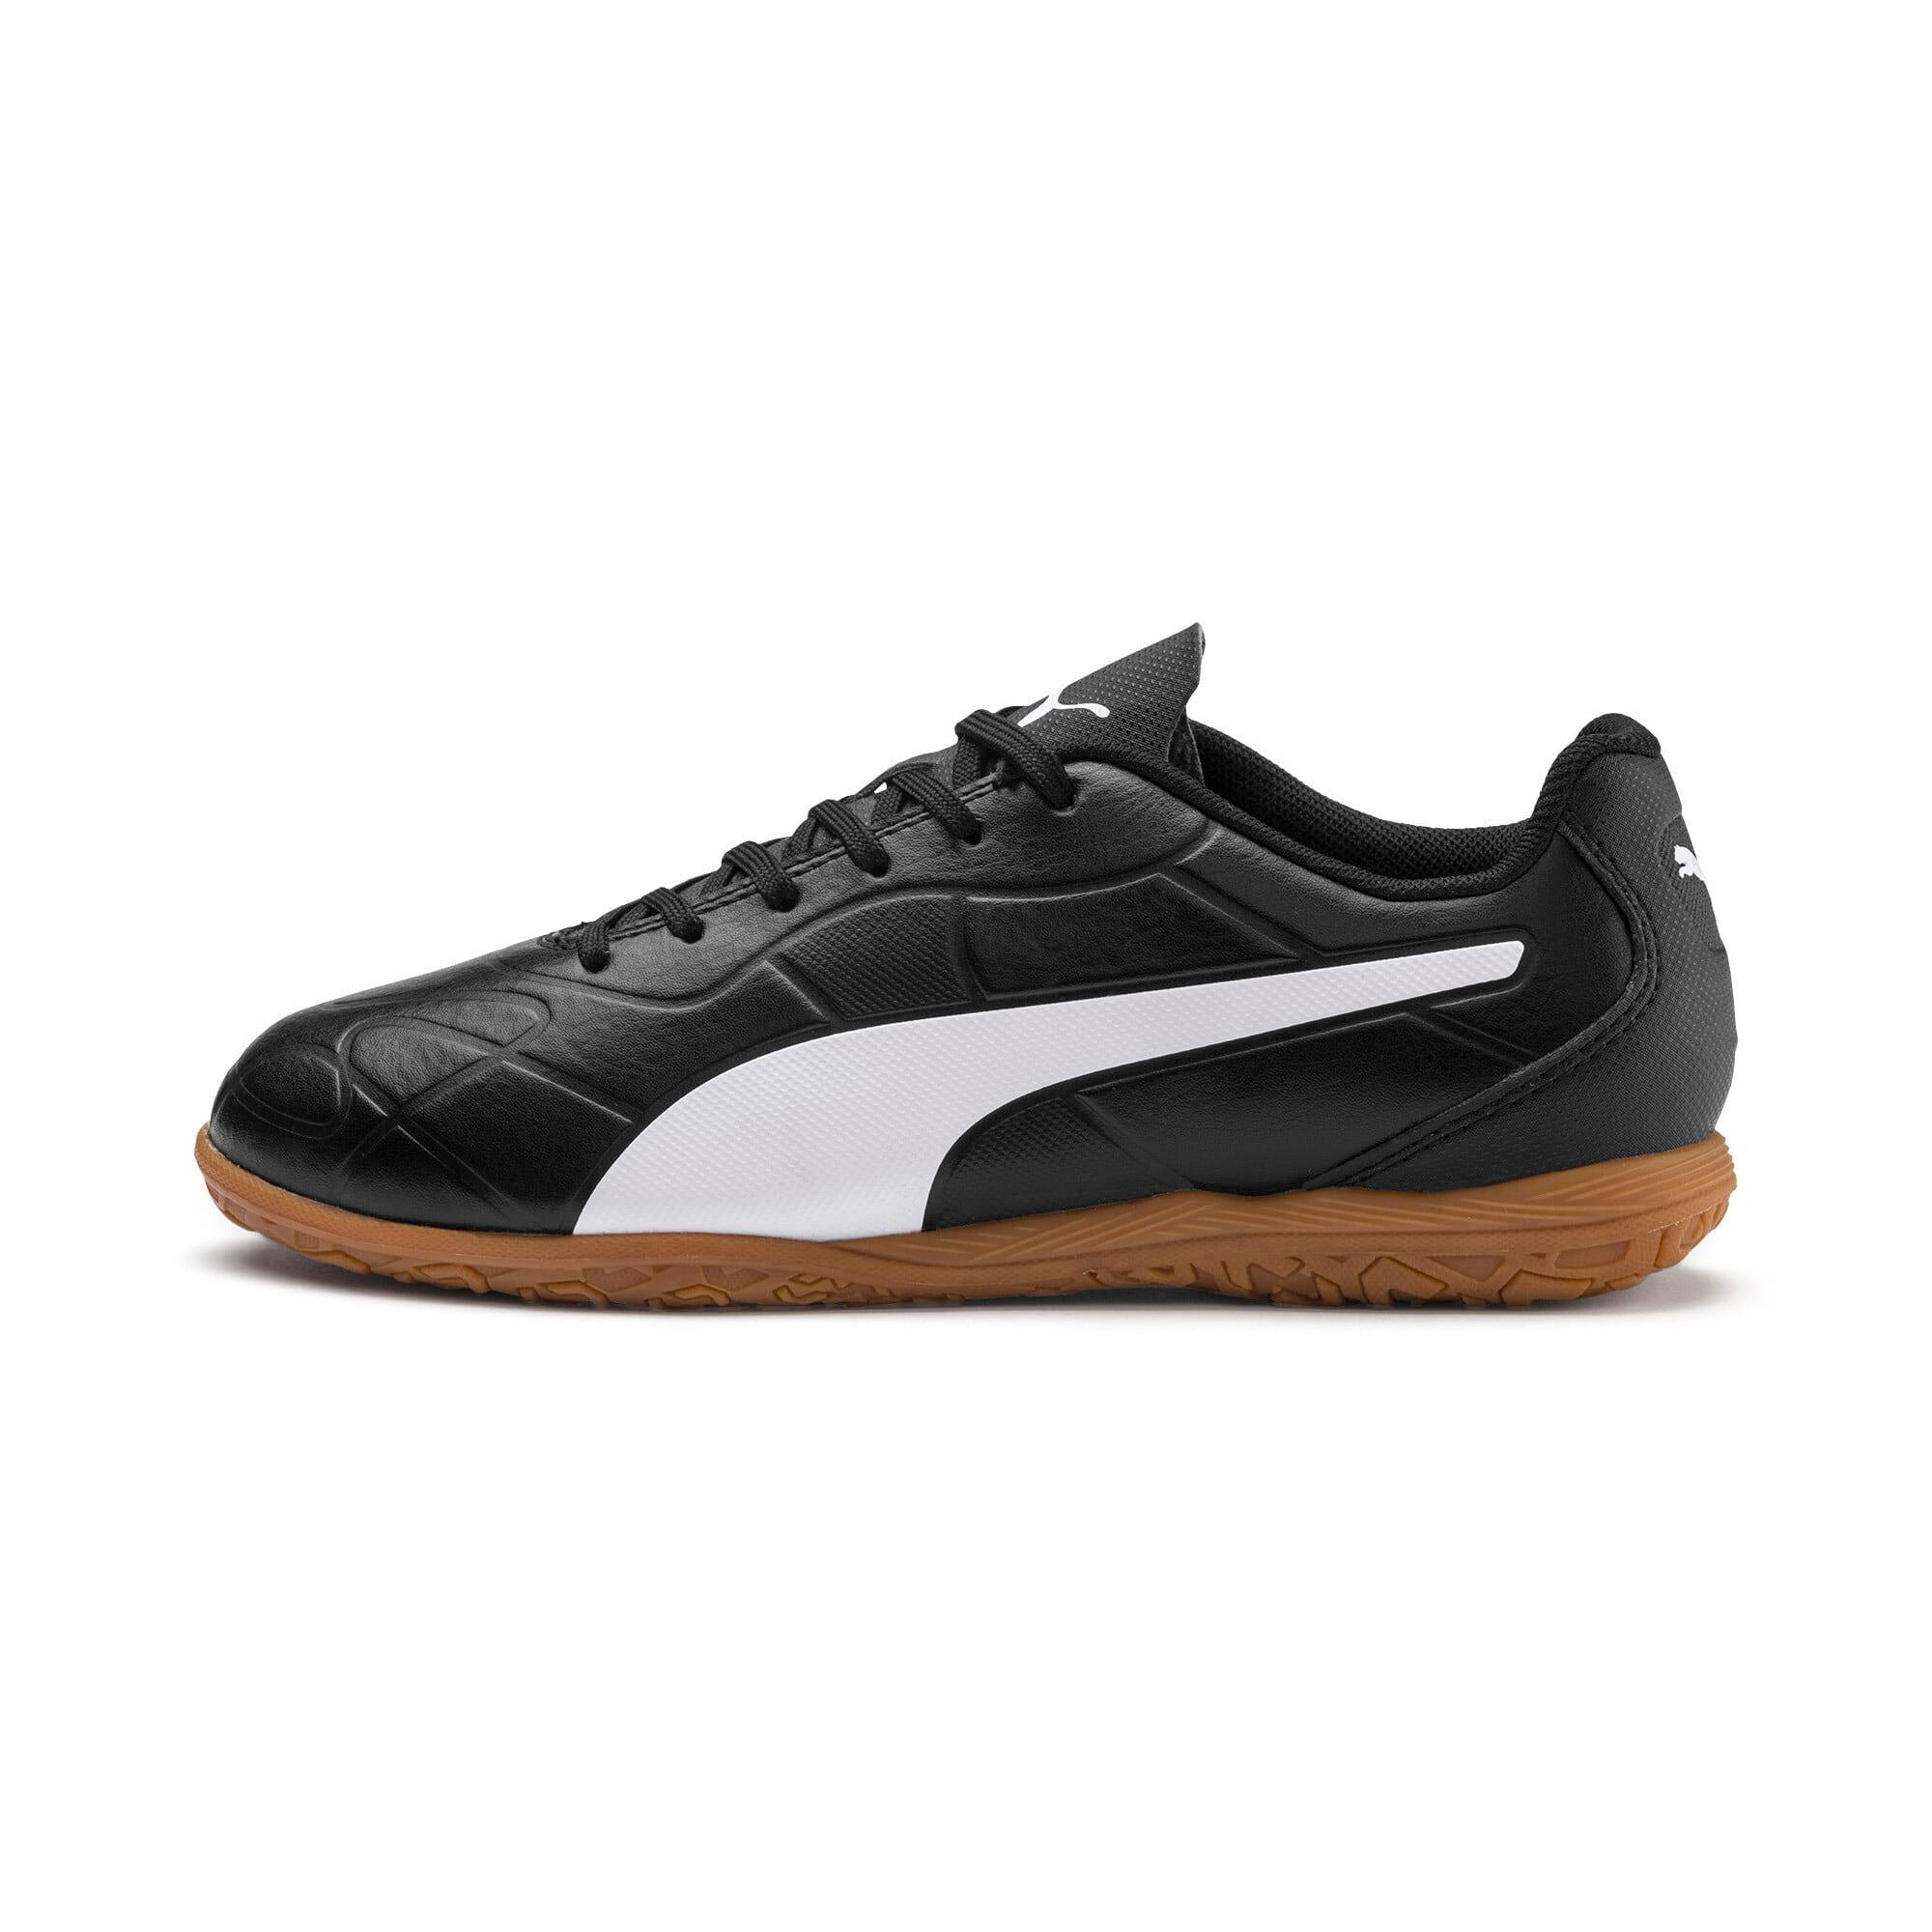 Thumbnail 1 of Monarch IT Youth Fußballschuhe, Puma Black-Puma White, medium